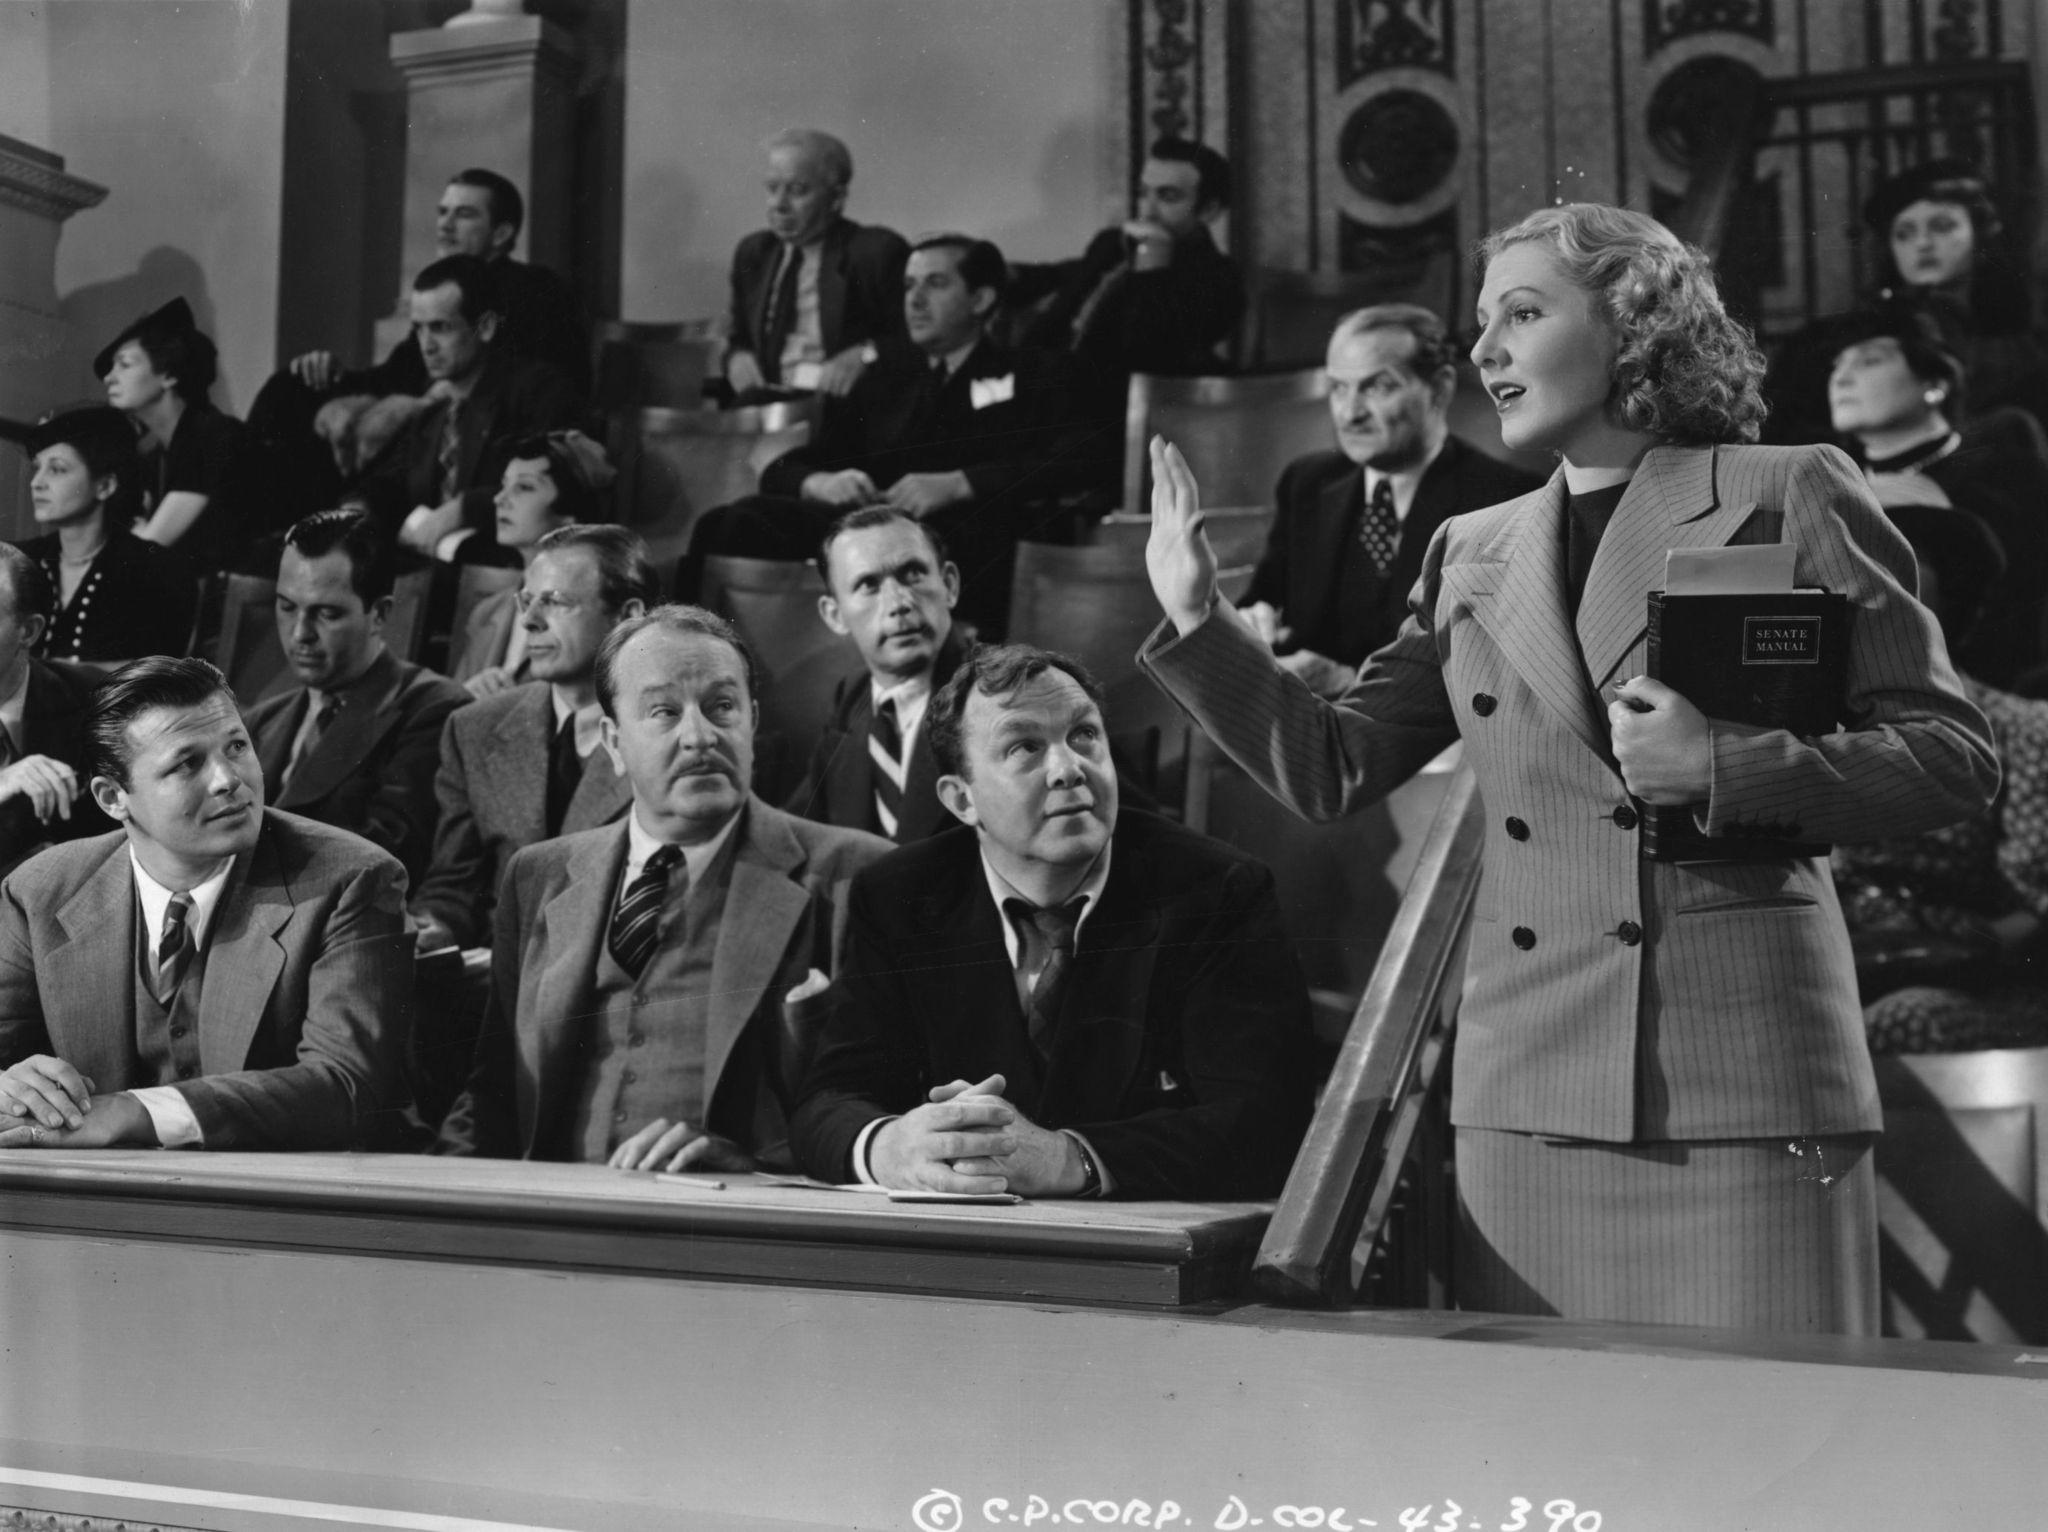 Jean Arthur, Jack Carson and Thomas Mitchell in Mr. Smith Goes to Washington (1939)